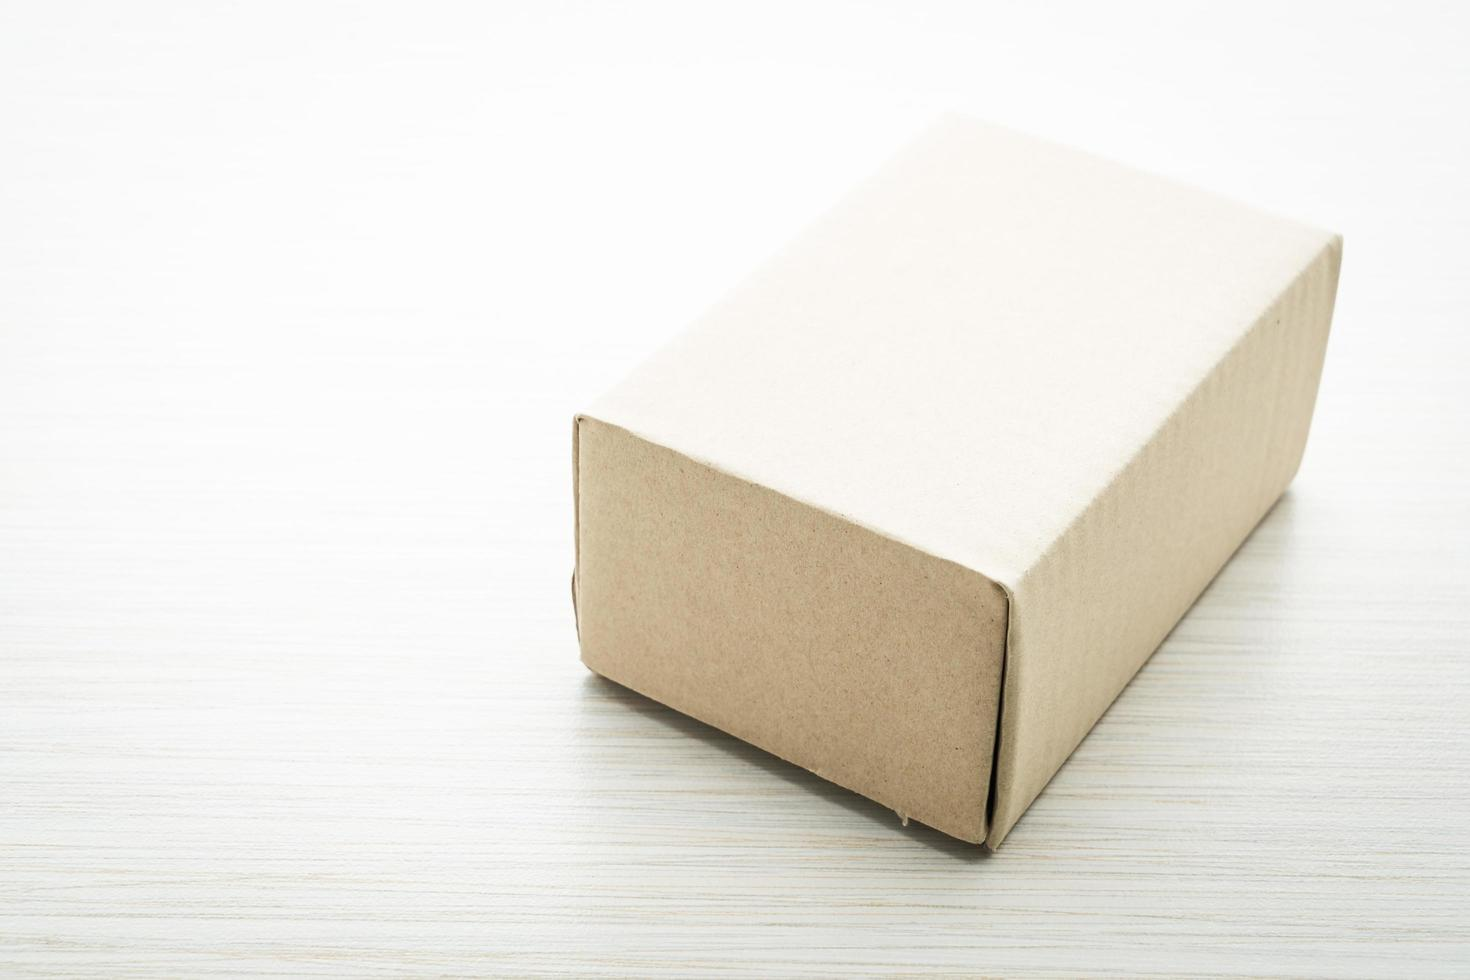 braune Box verspotten foto